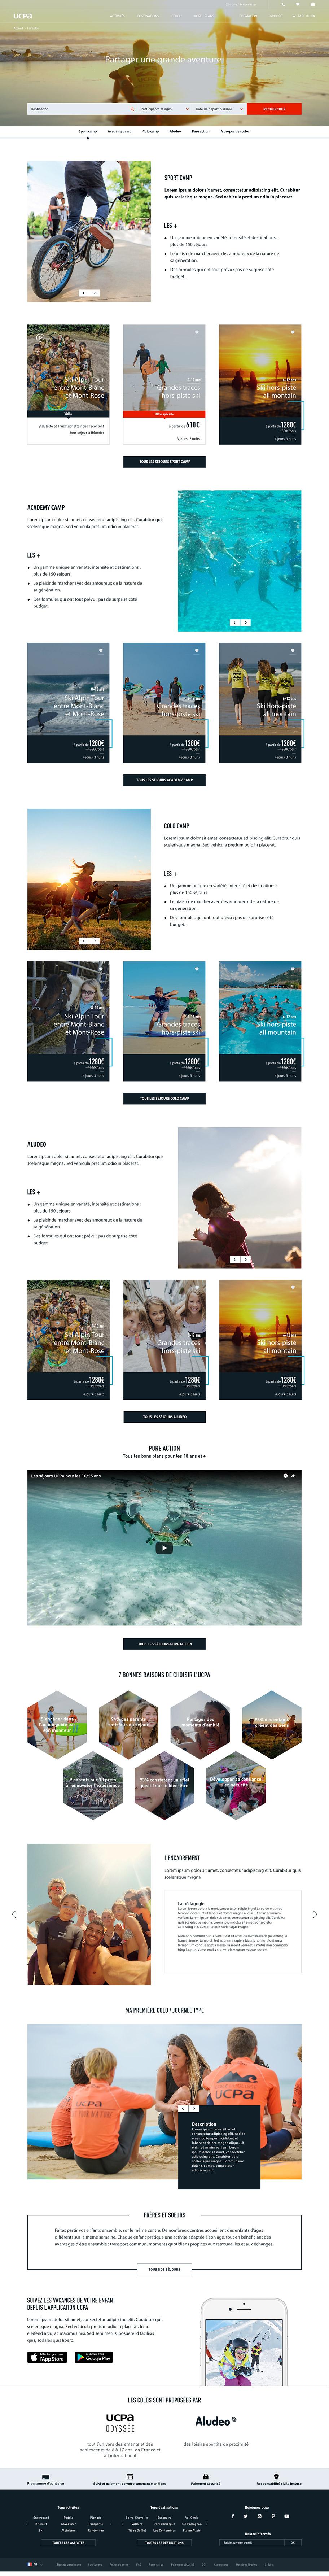 UCPA - Site e-commerce homepage mineurs